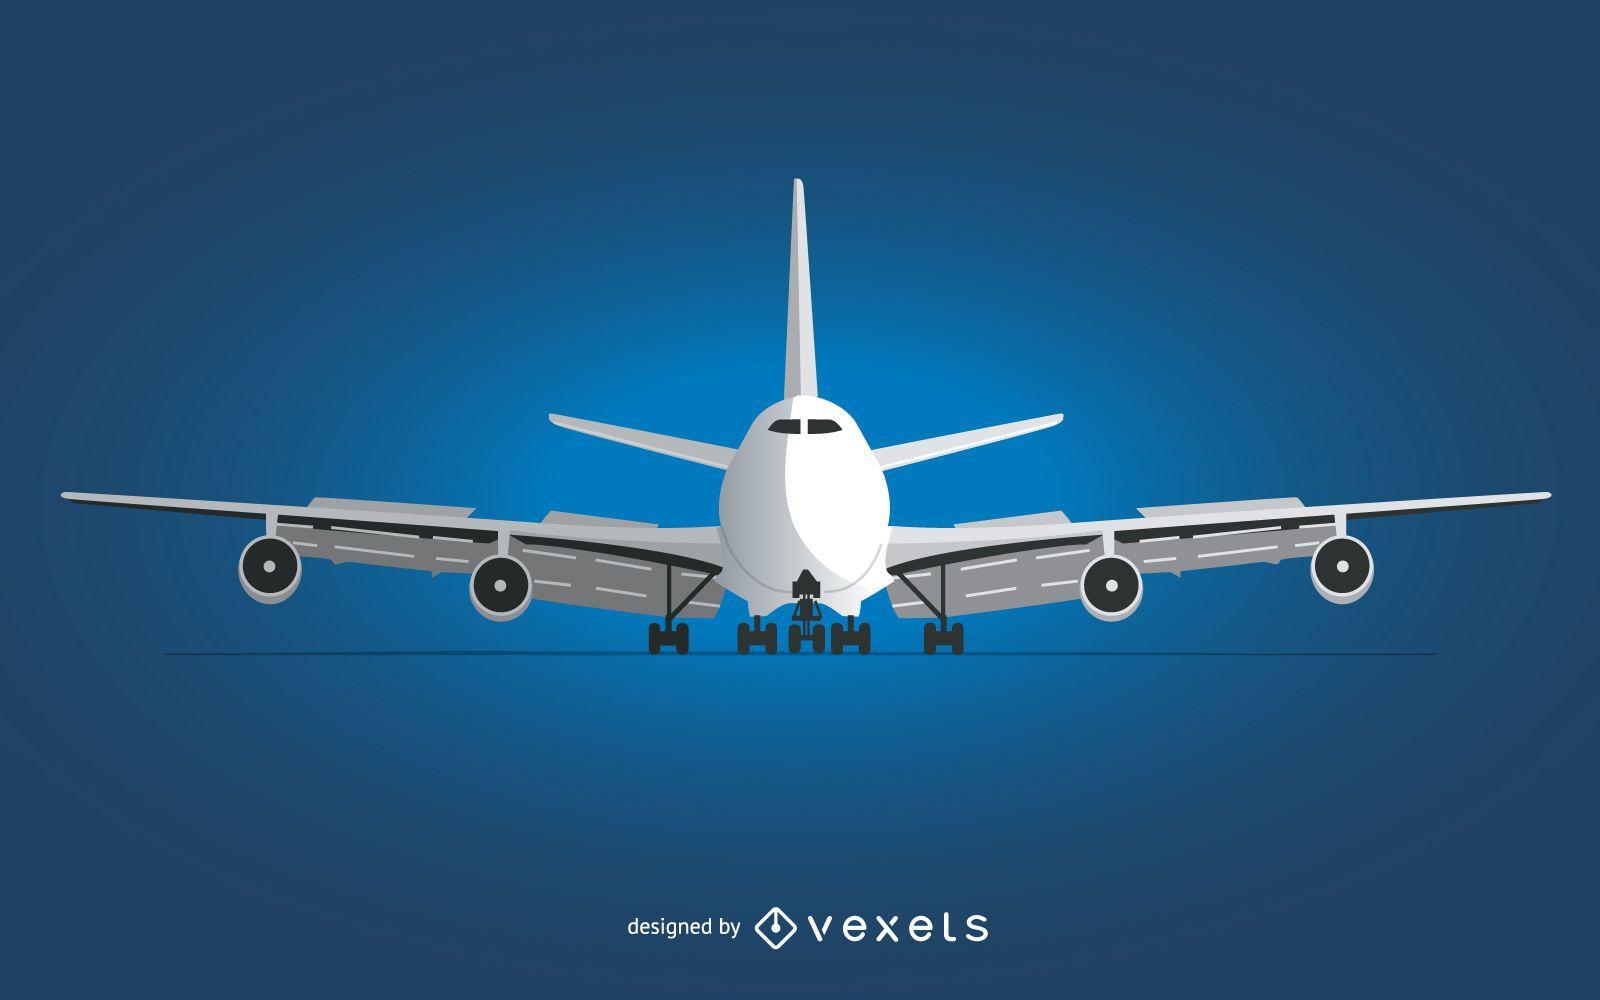 Plane front view illustration